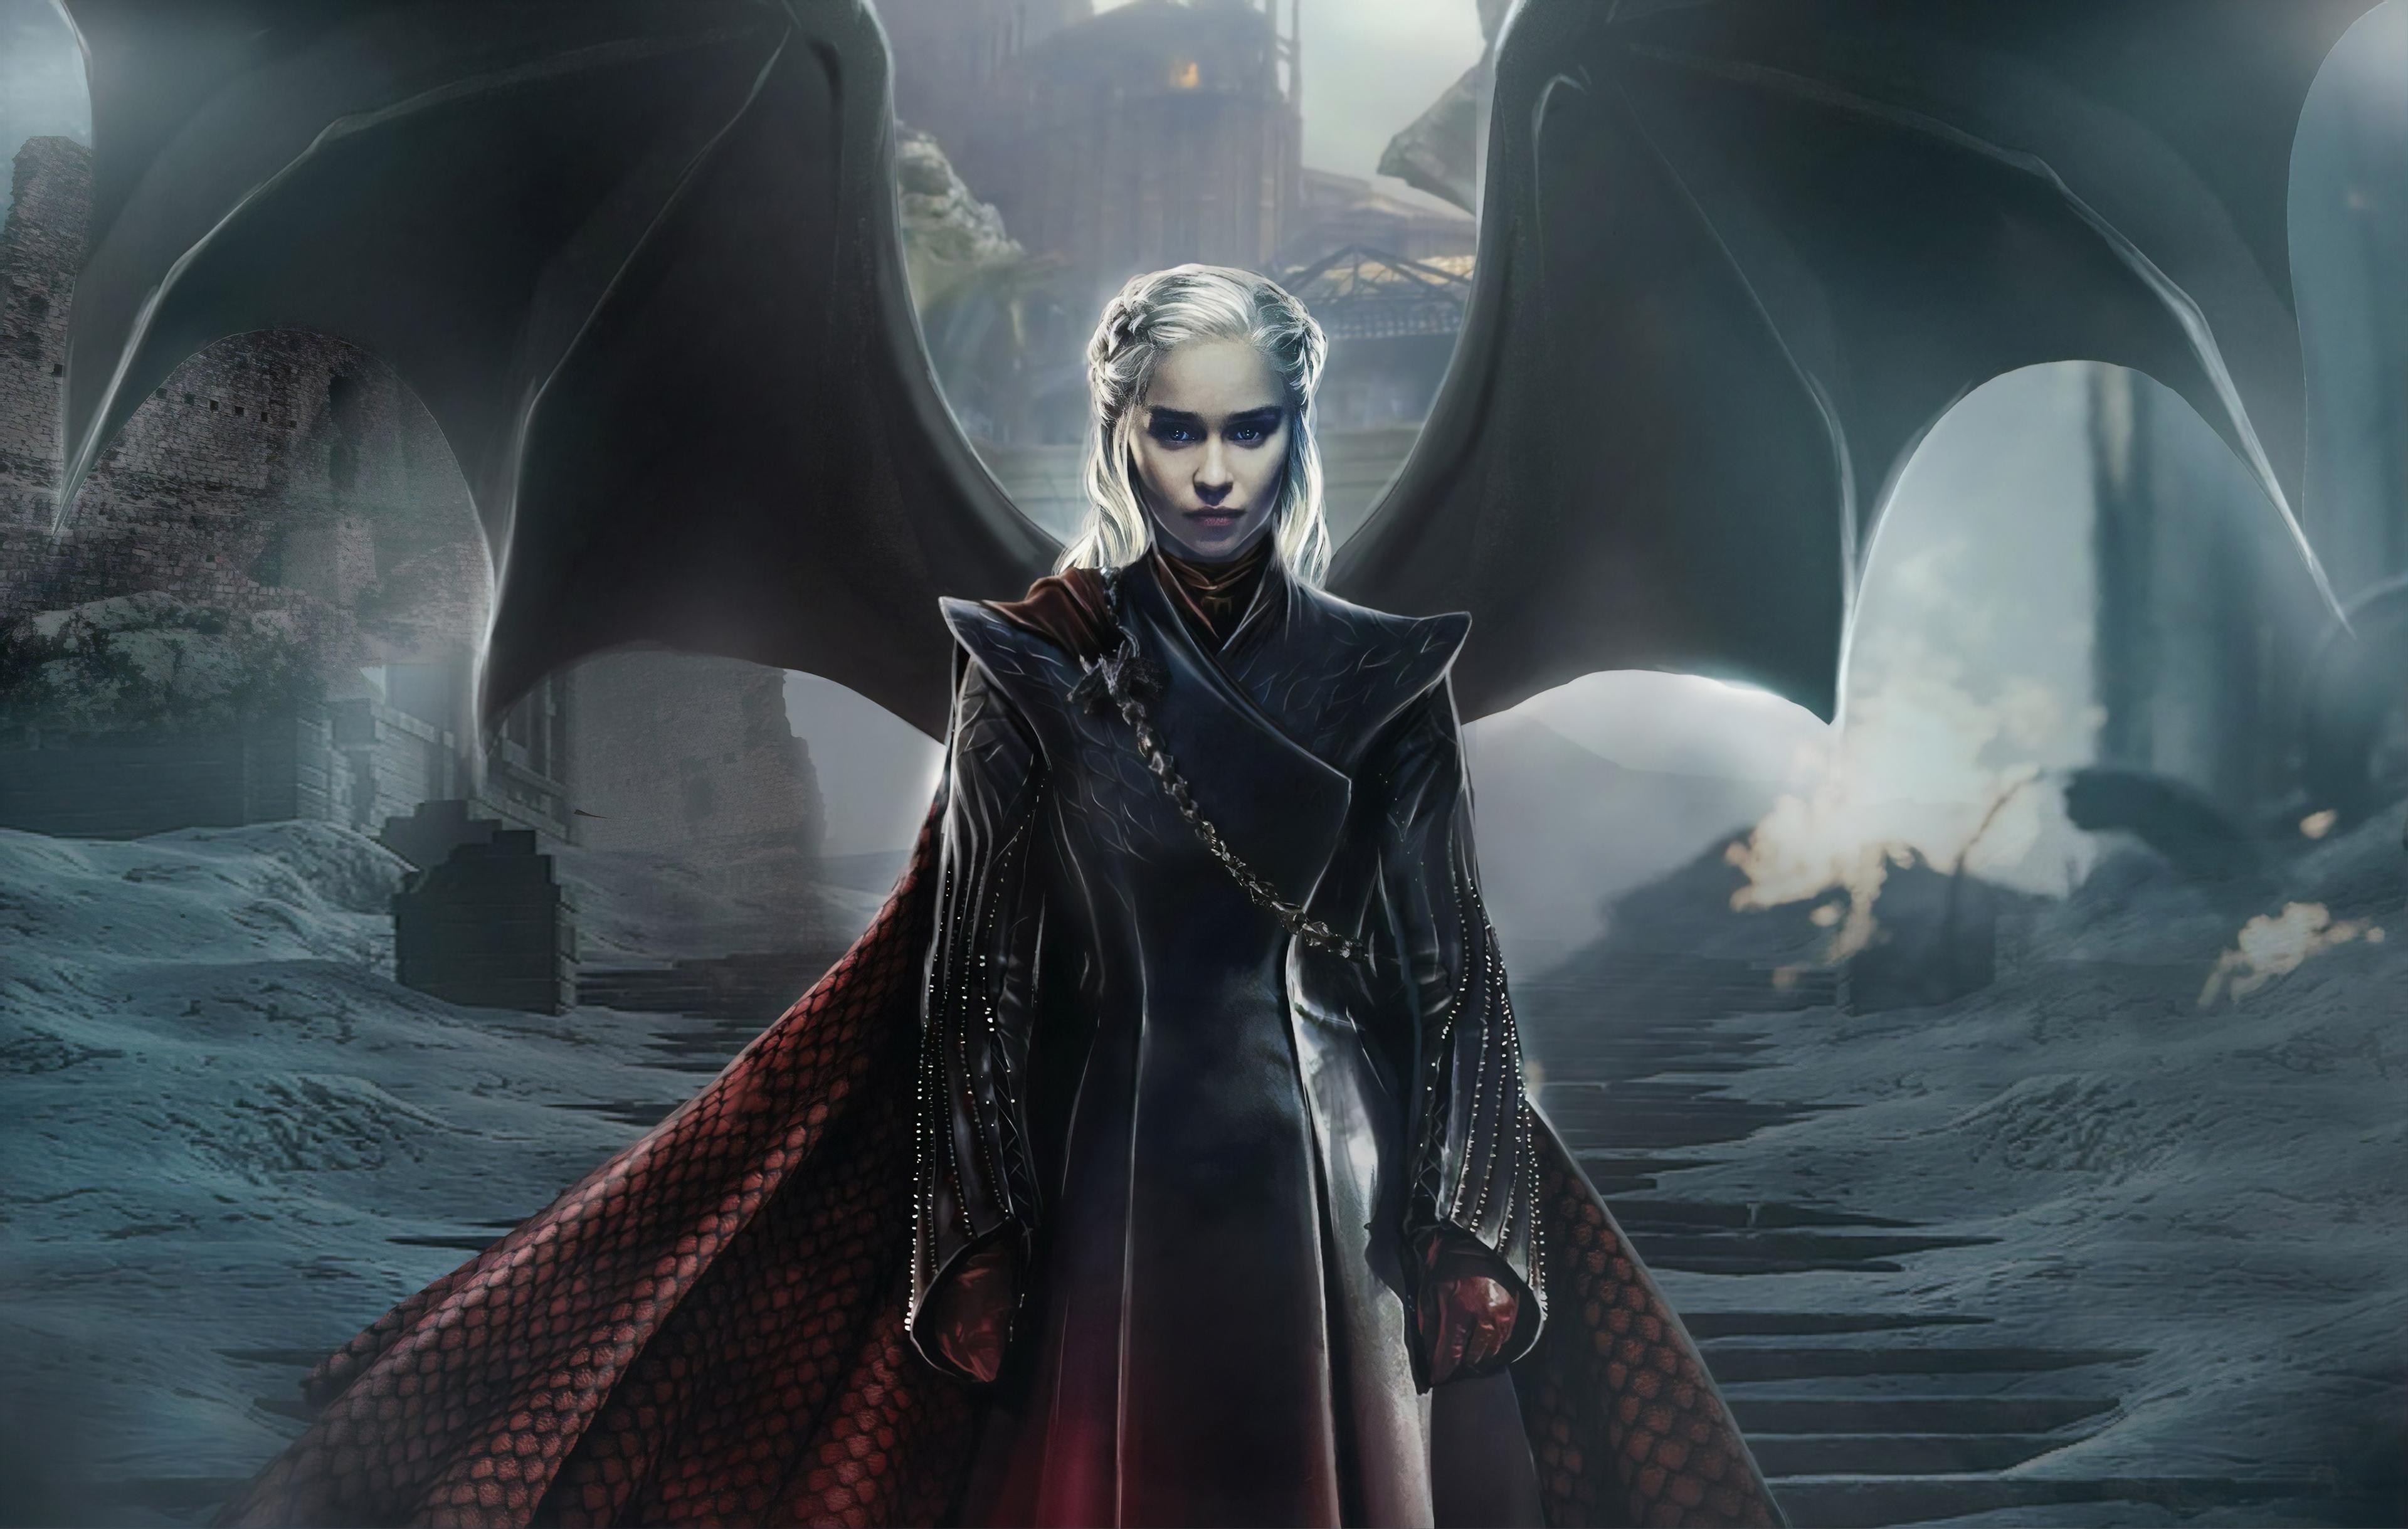 daenerys targaryen game of thrones 1577915101 - Daenerys Targaryen Game Of Thrones -